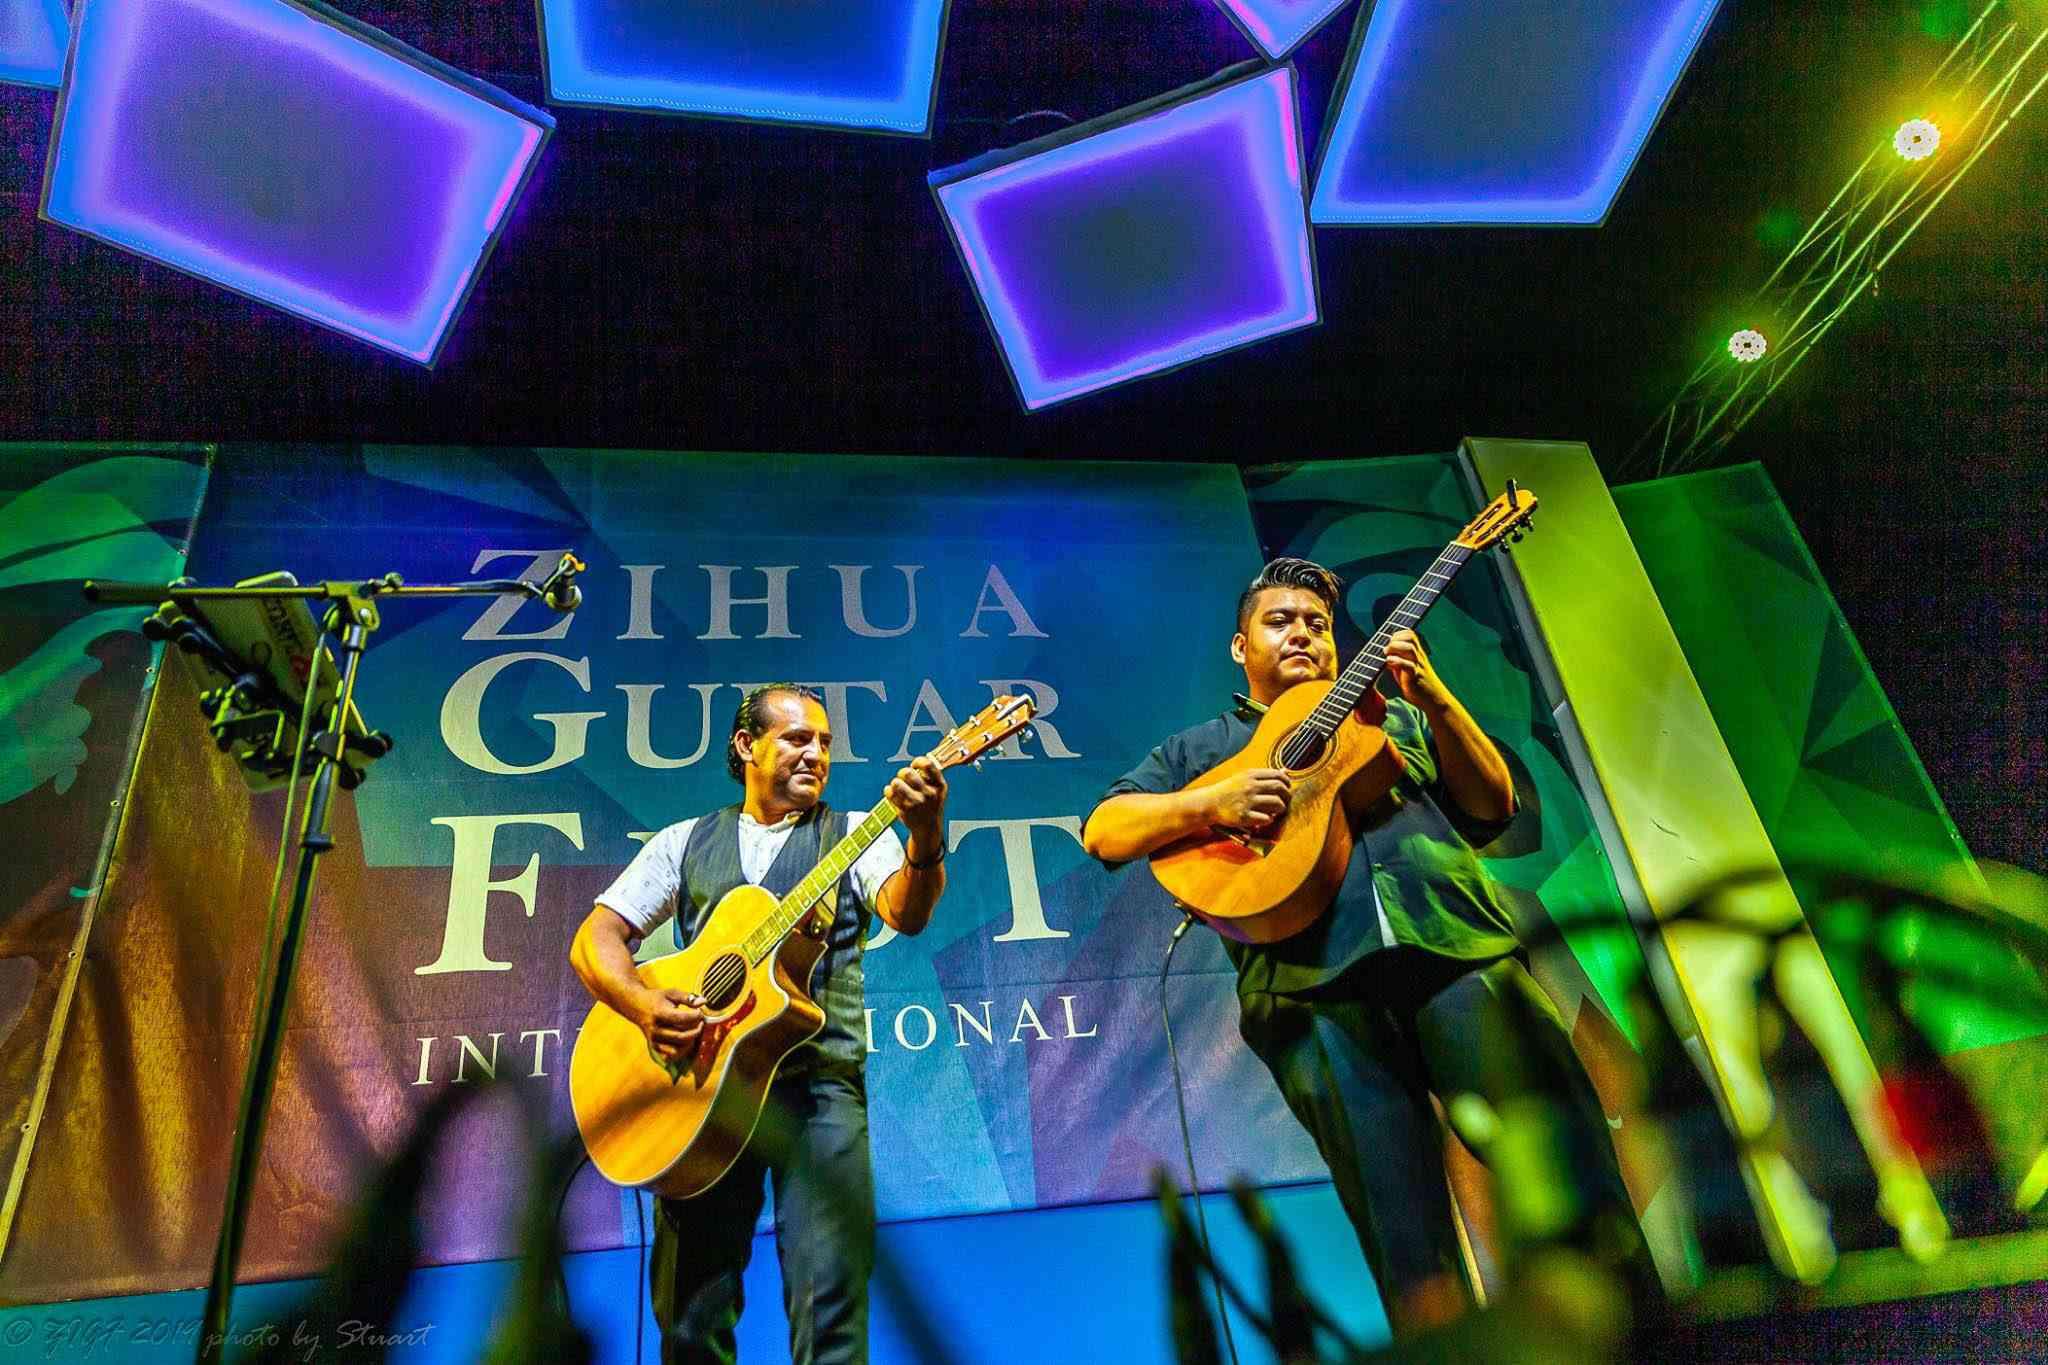 Zihua Guitar Fest